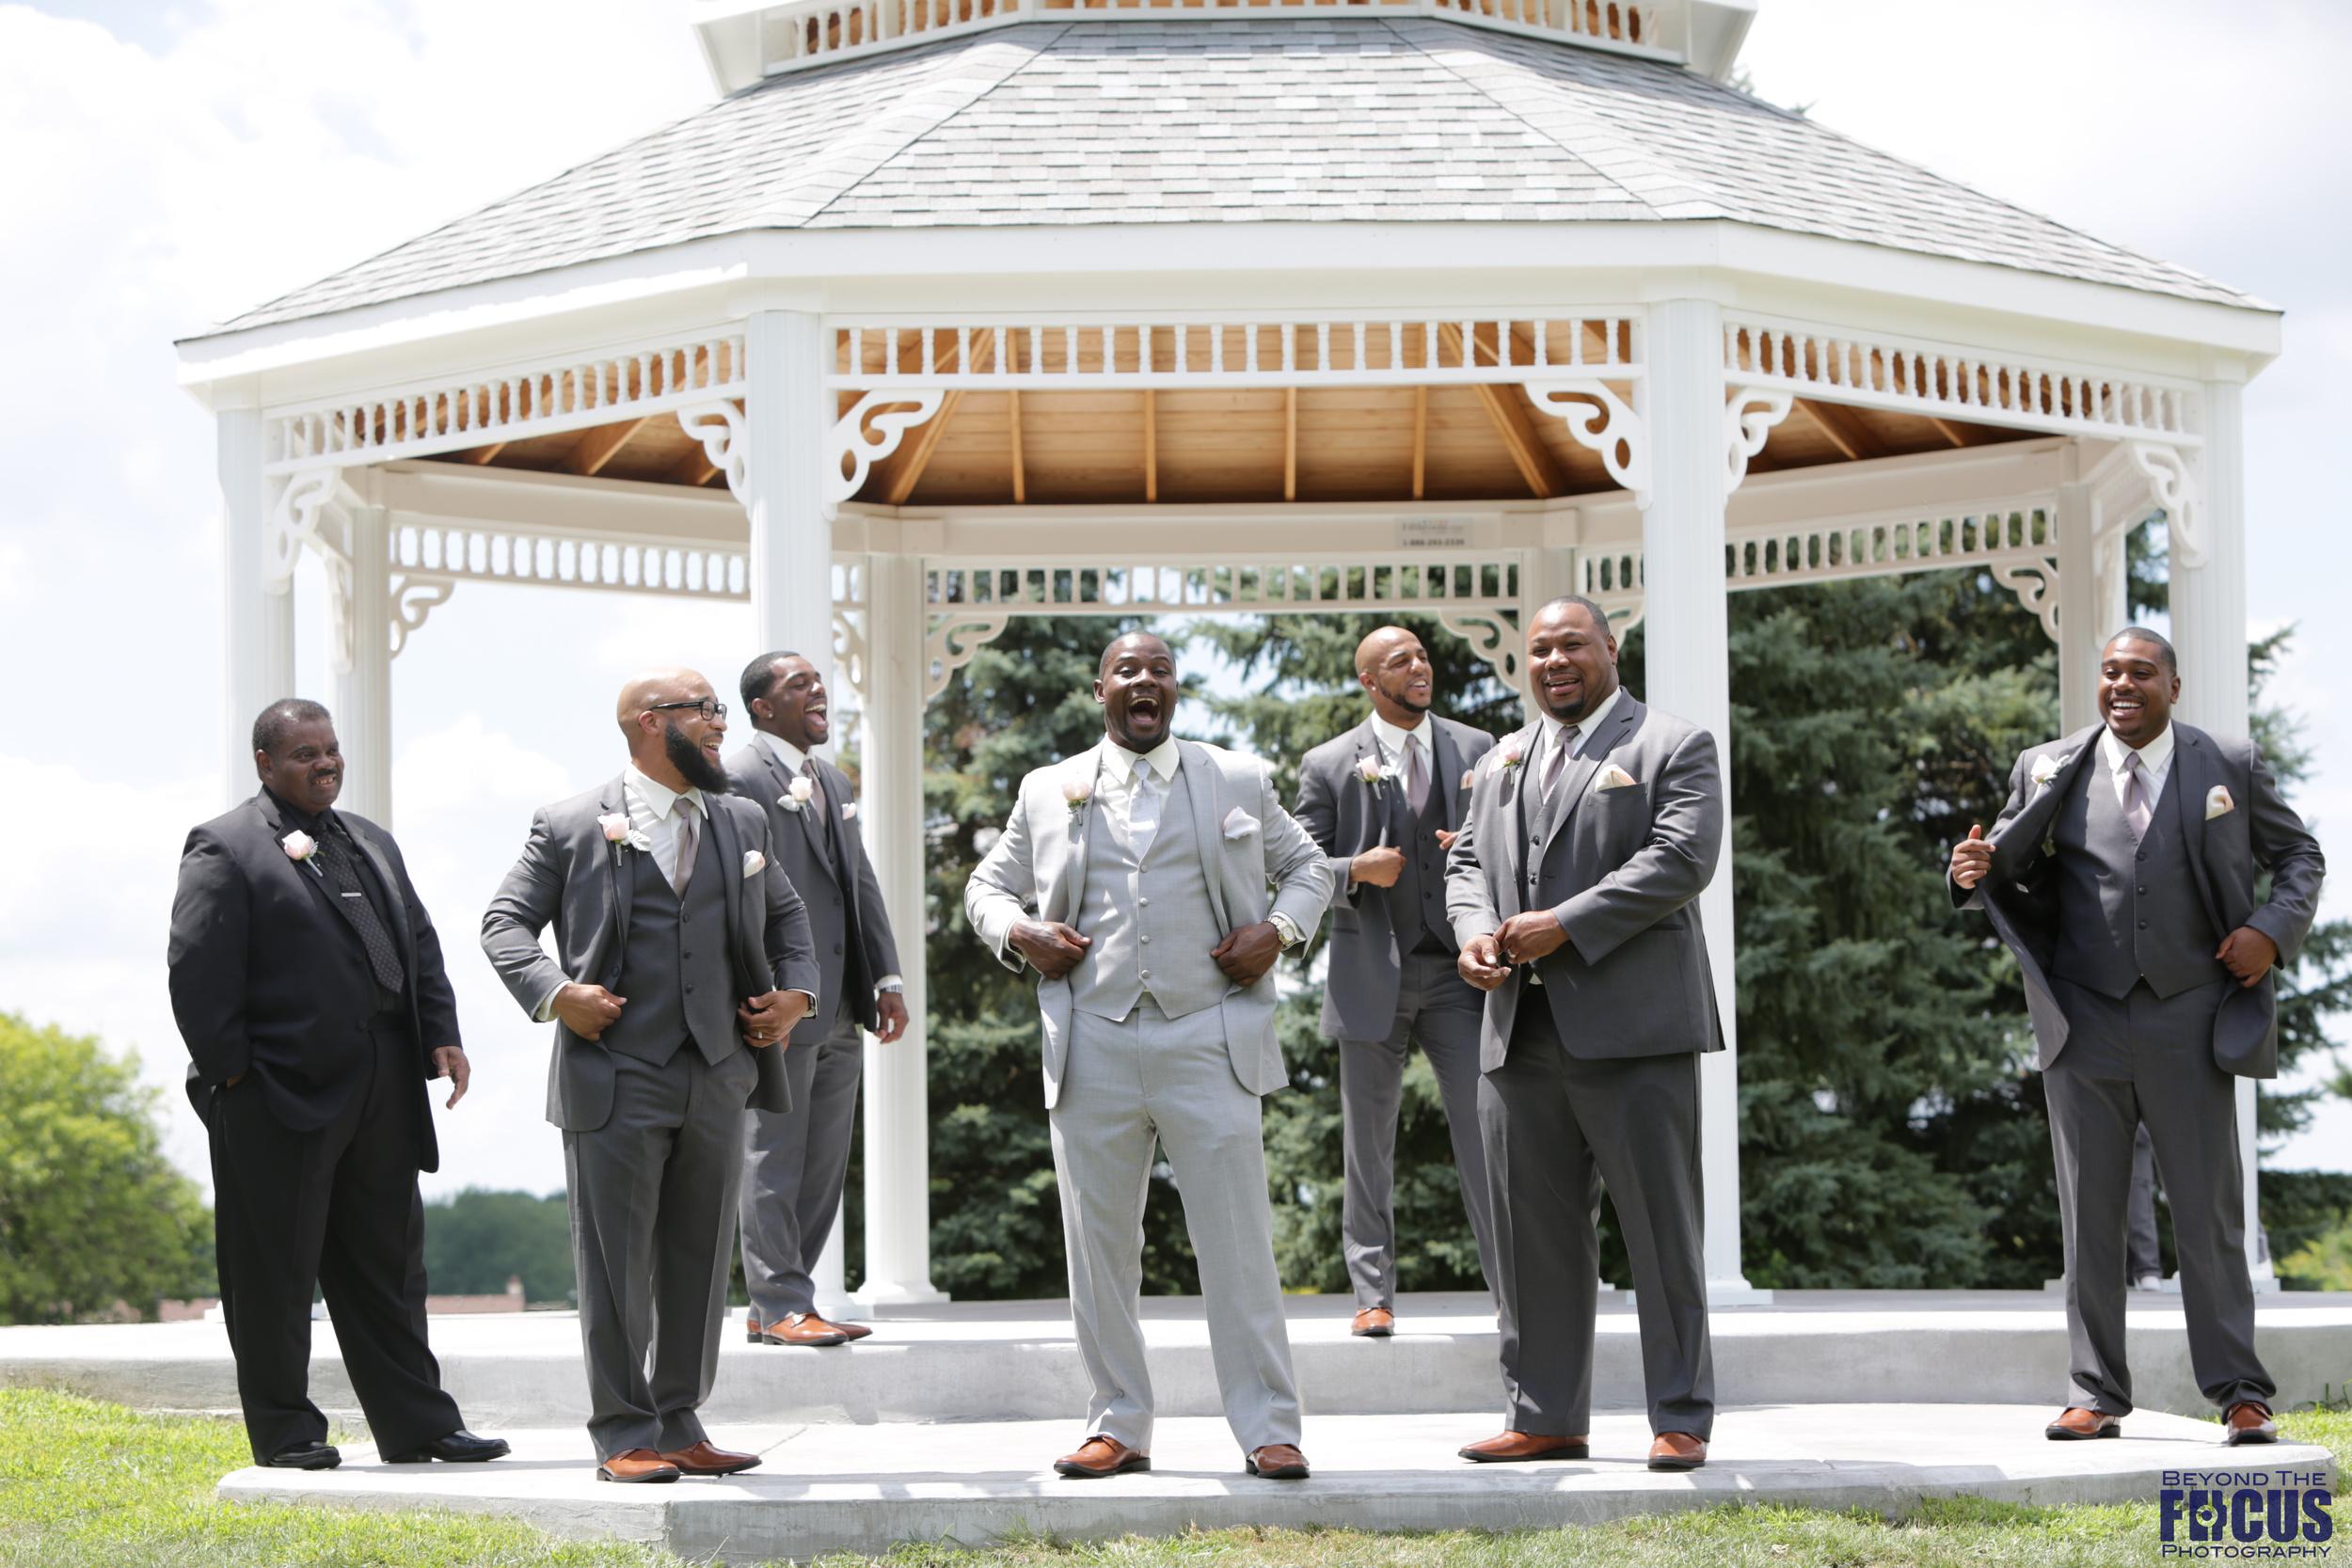 Palmer Wedding - Candids7.jpg